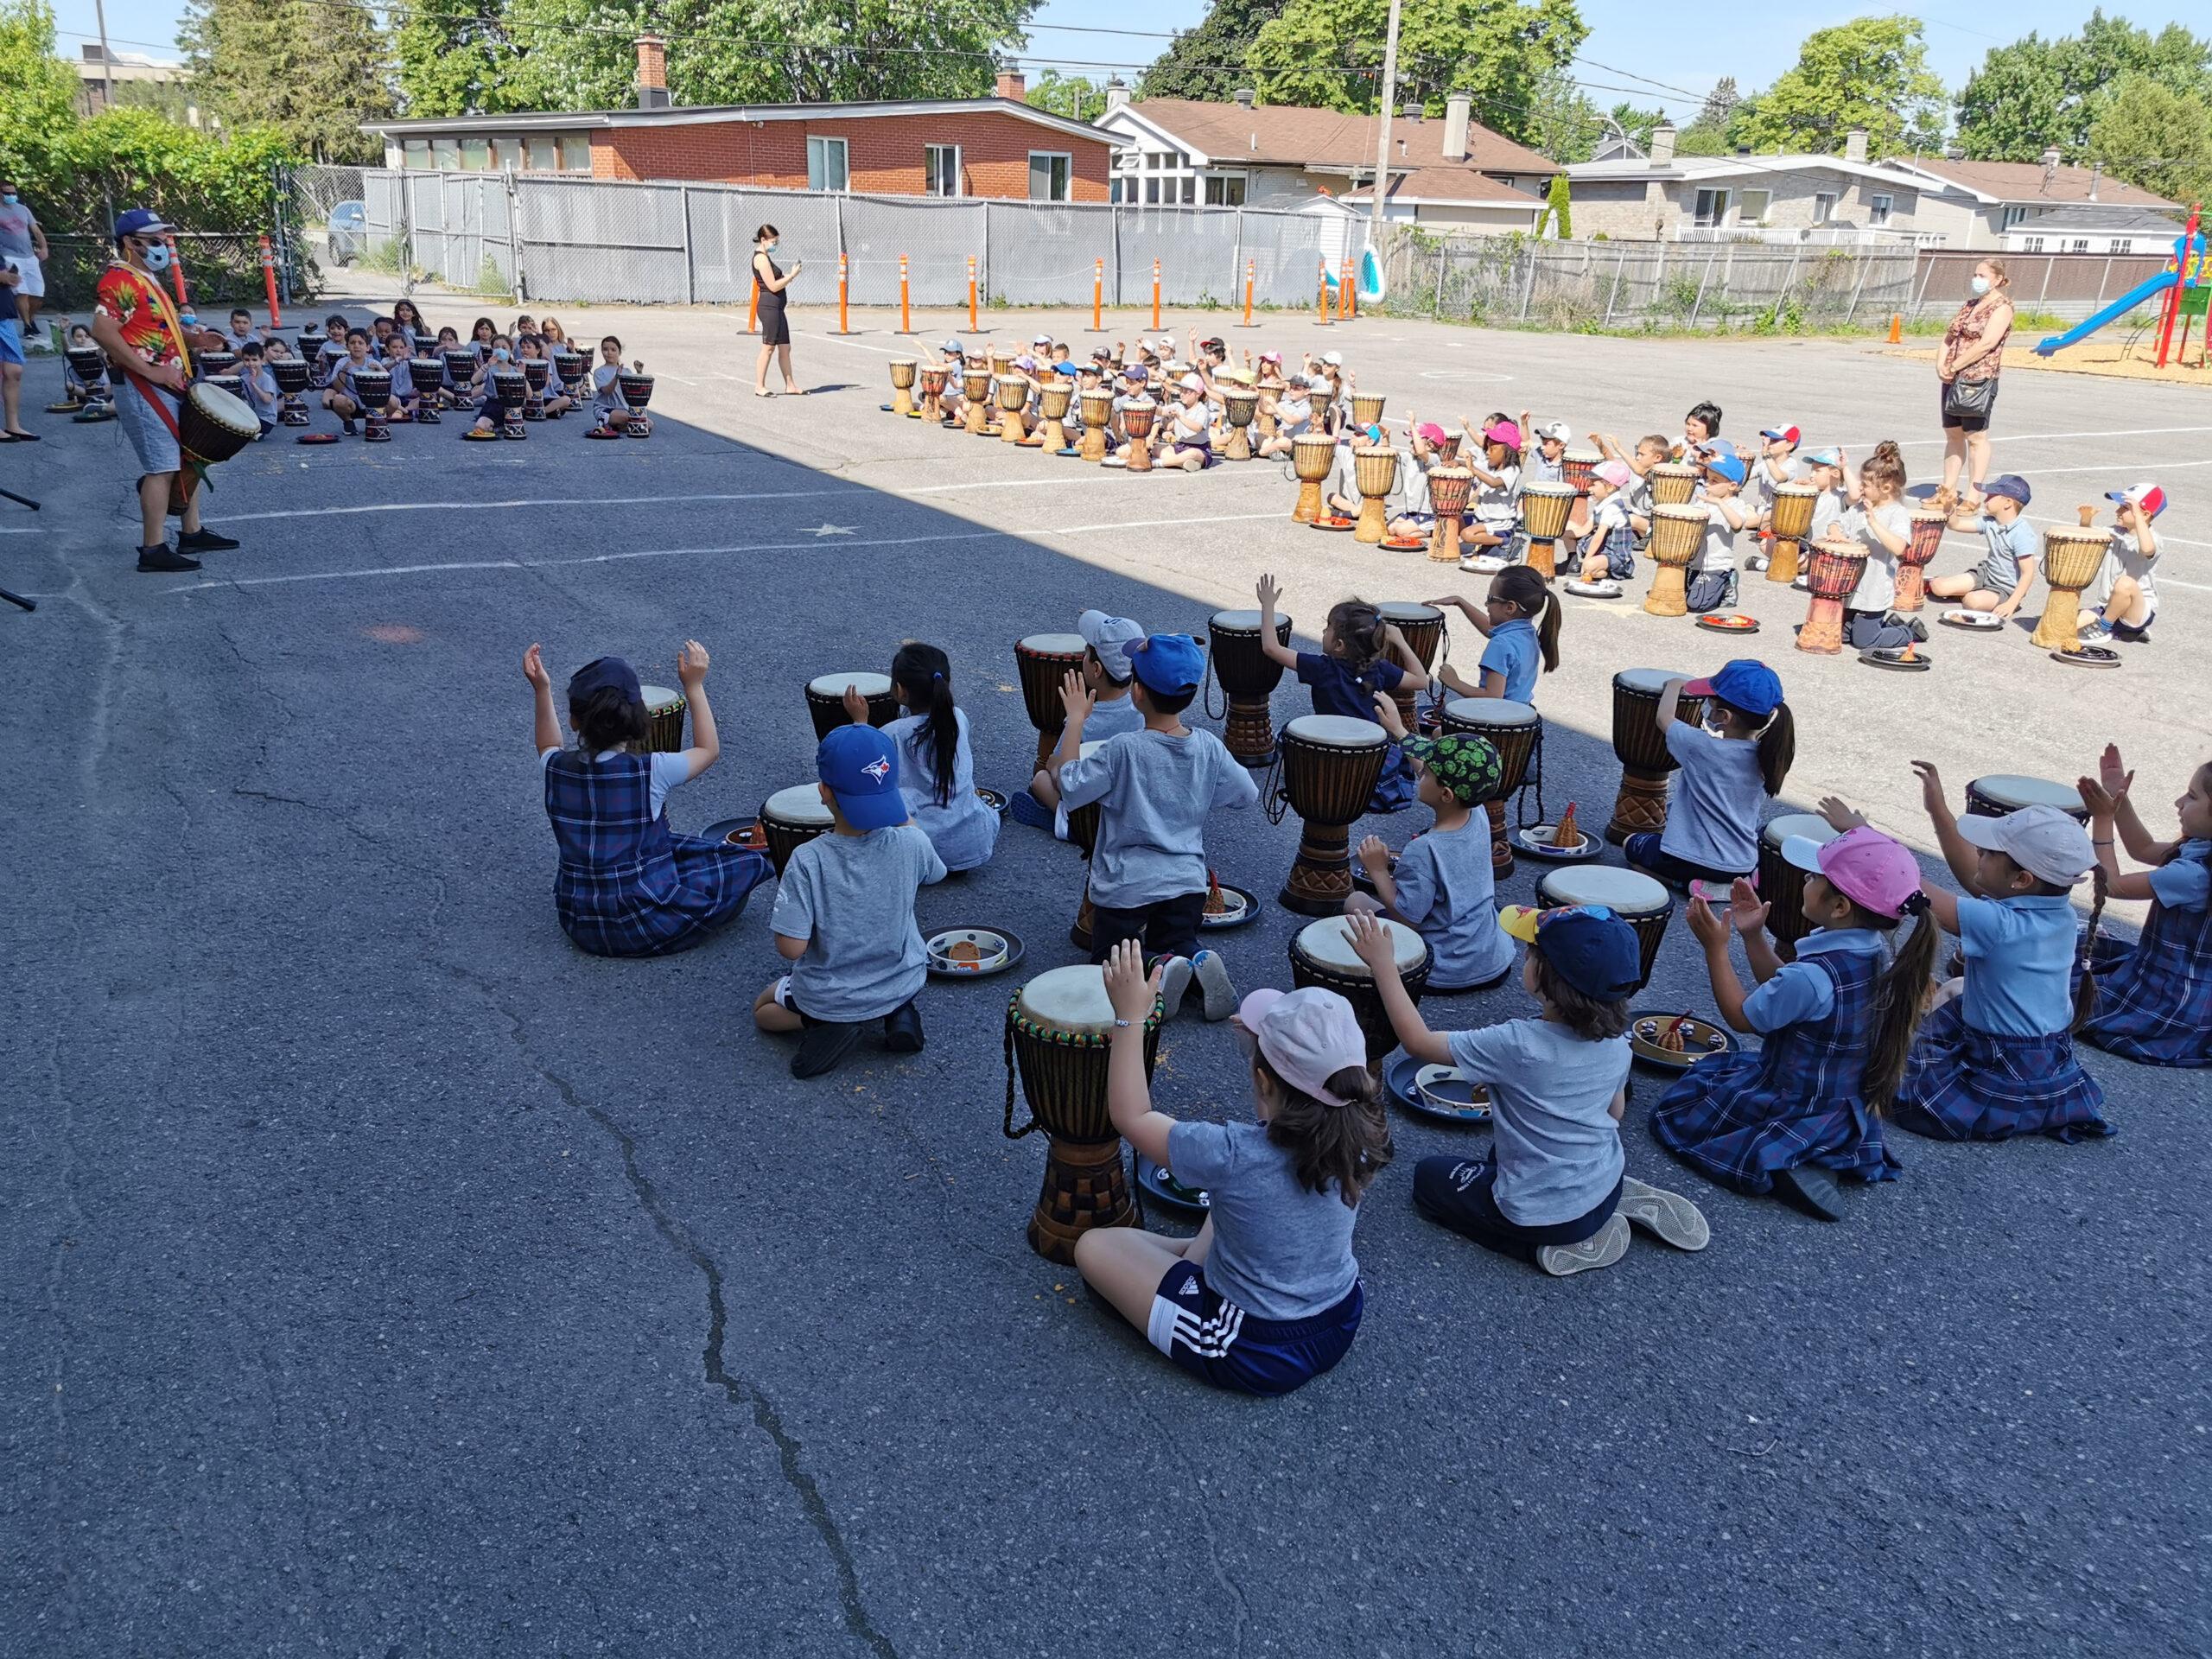 Impactful Drumming at the Demosthenes Campus